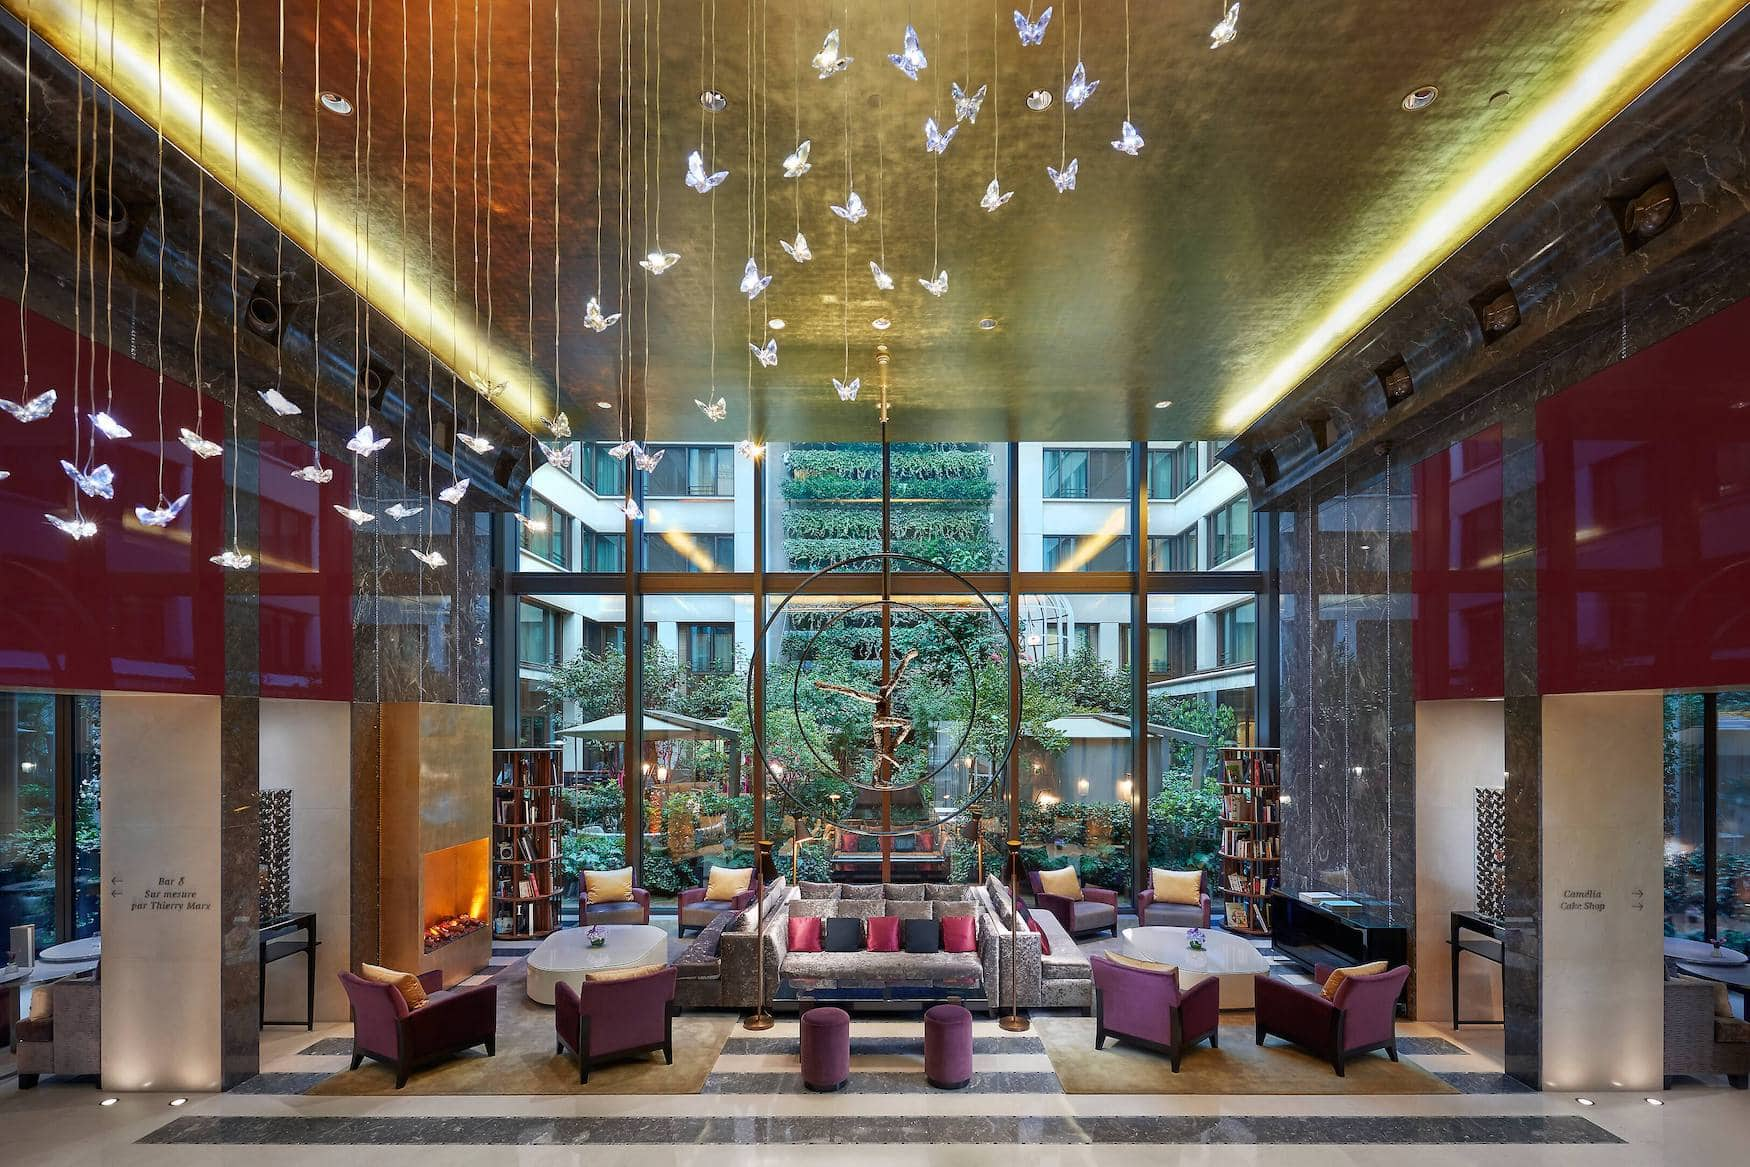 Lobby in Luxushotel in Paris